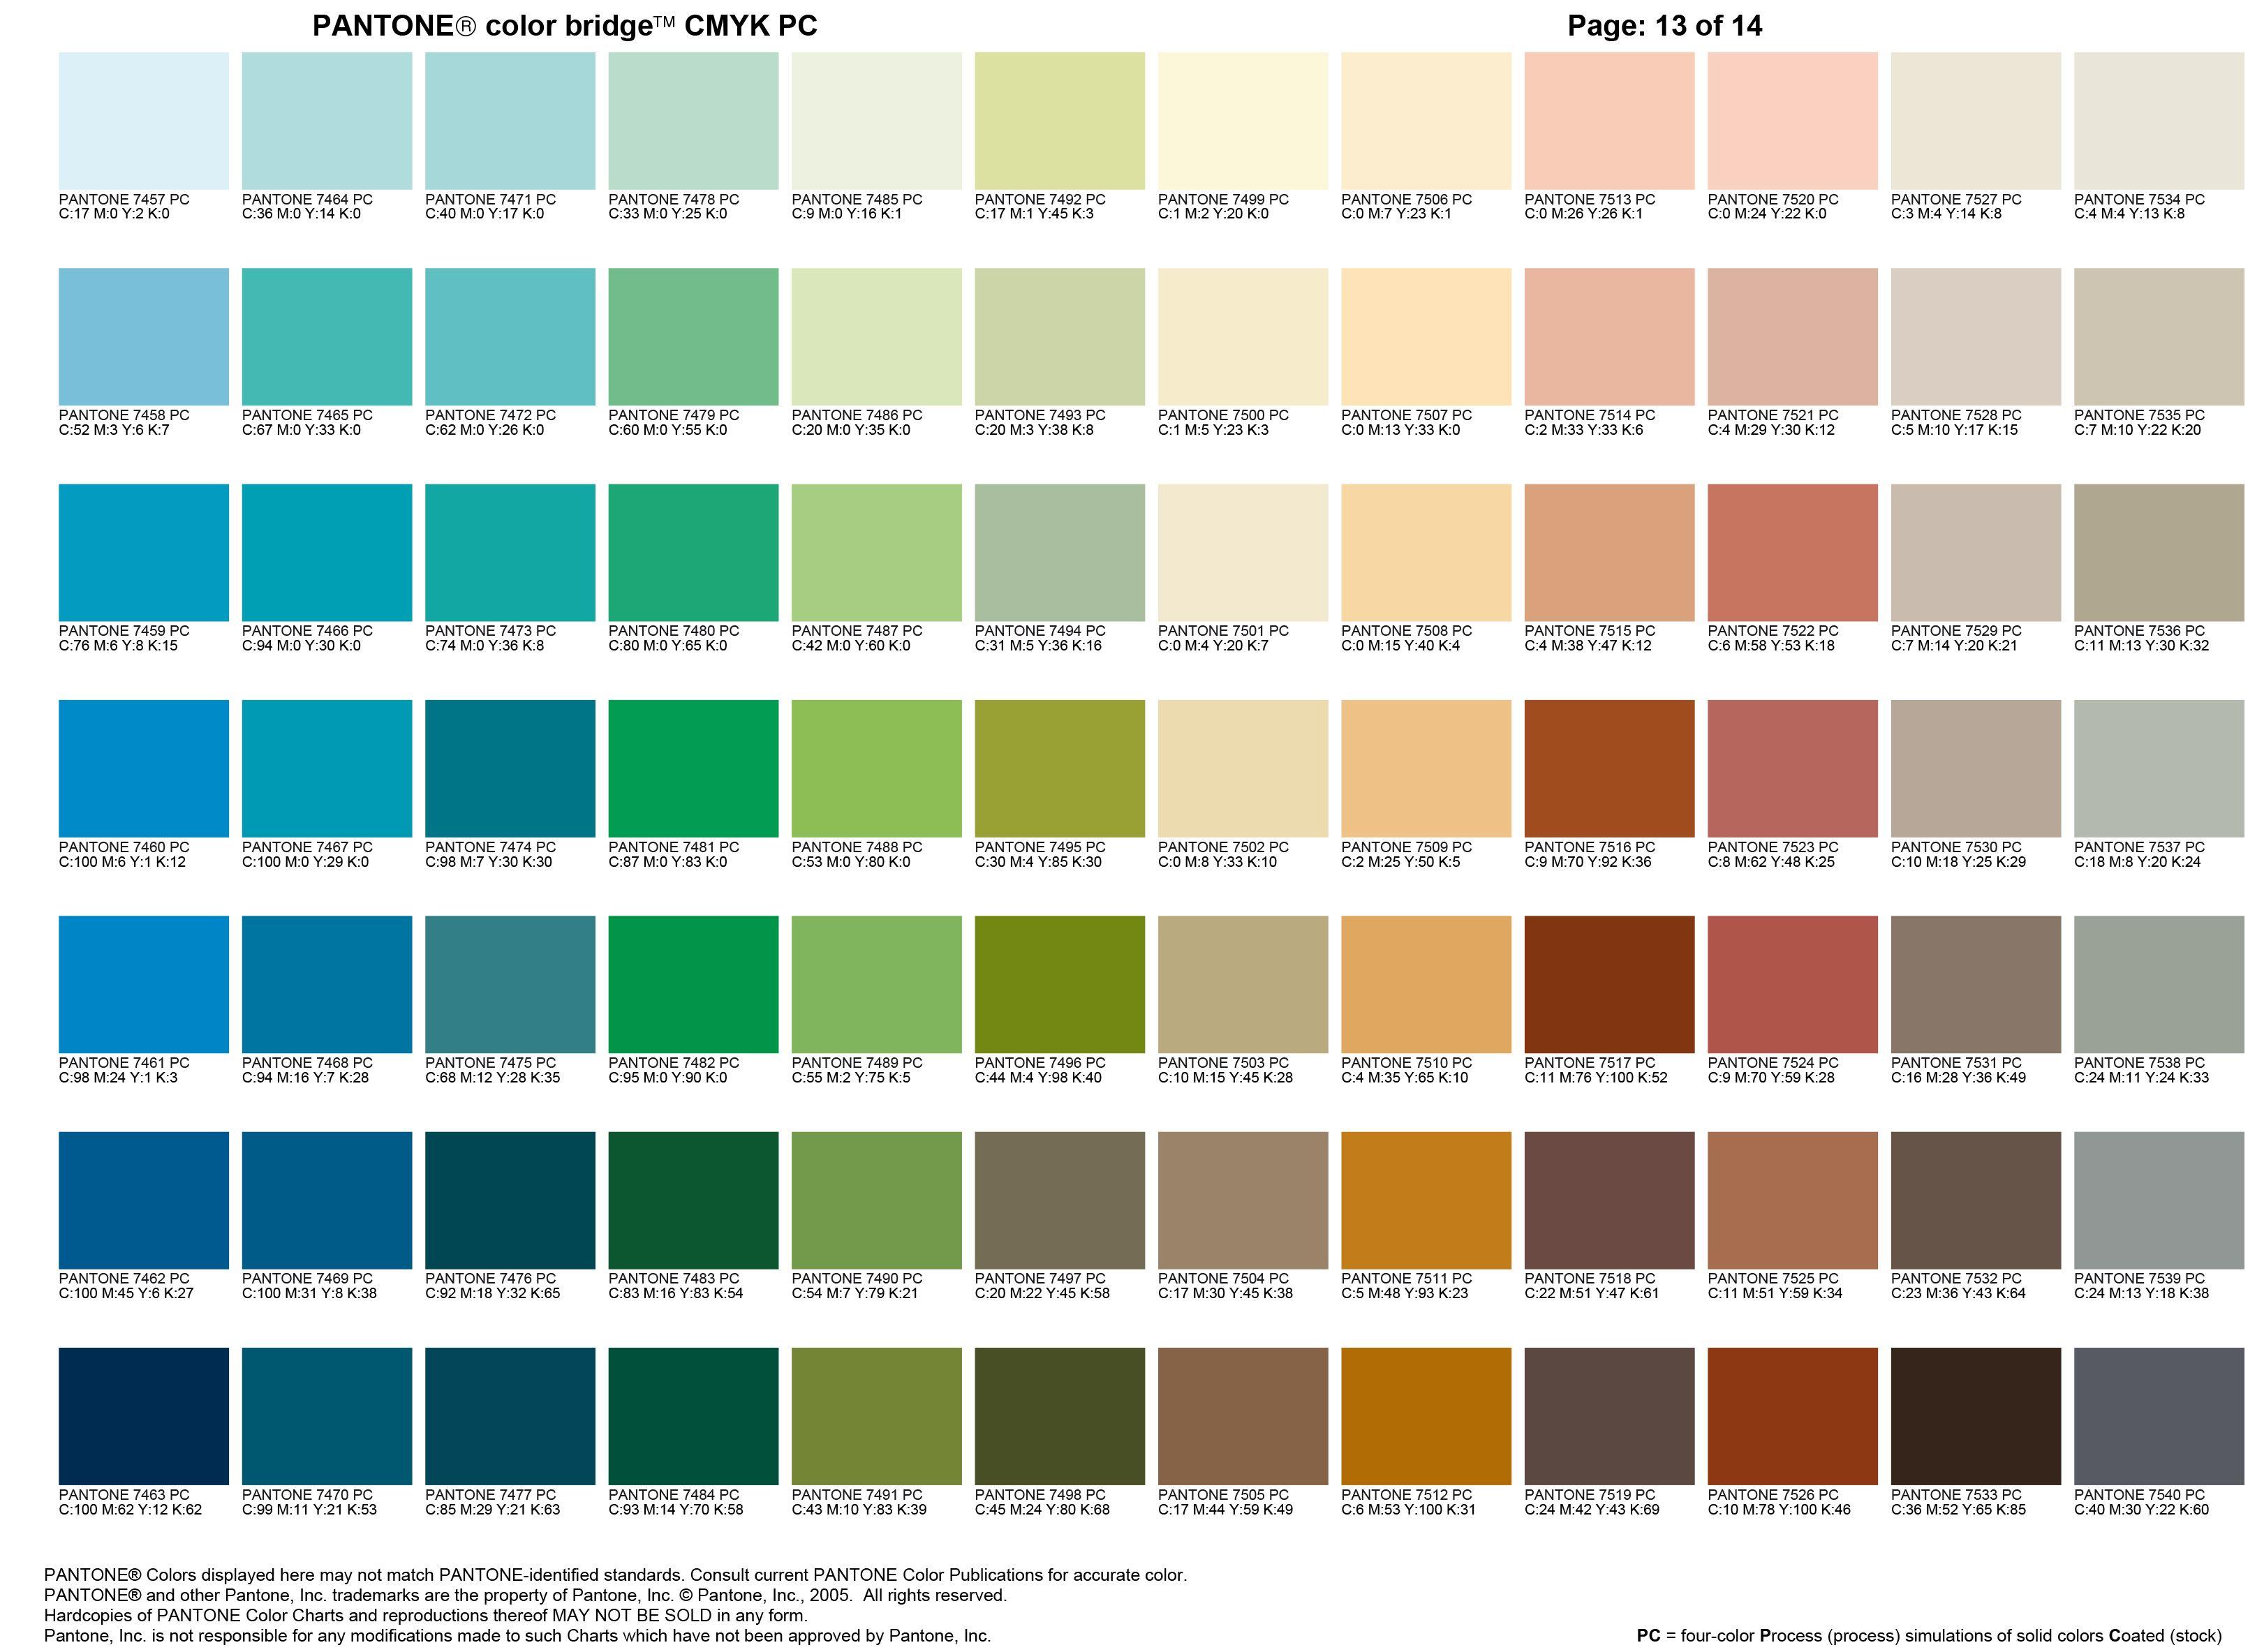 Carta color pantone 13 color pantone chart 13 paletas de carta color pantone 13 color pantone chart 13 nvjuhfo Image collections